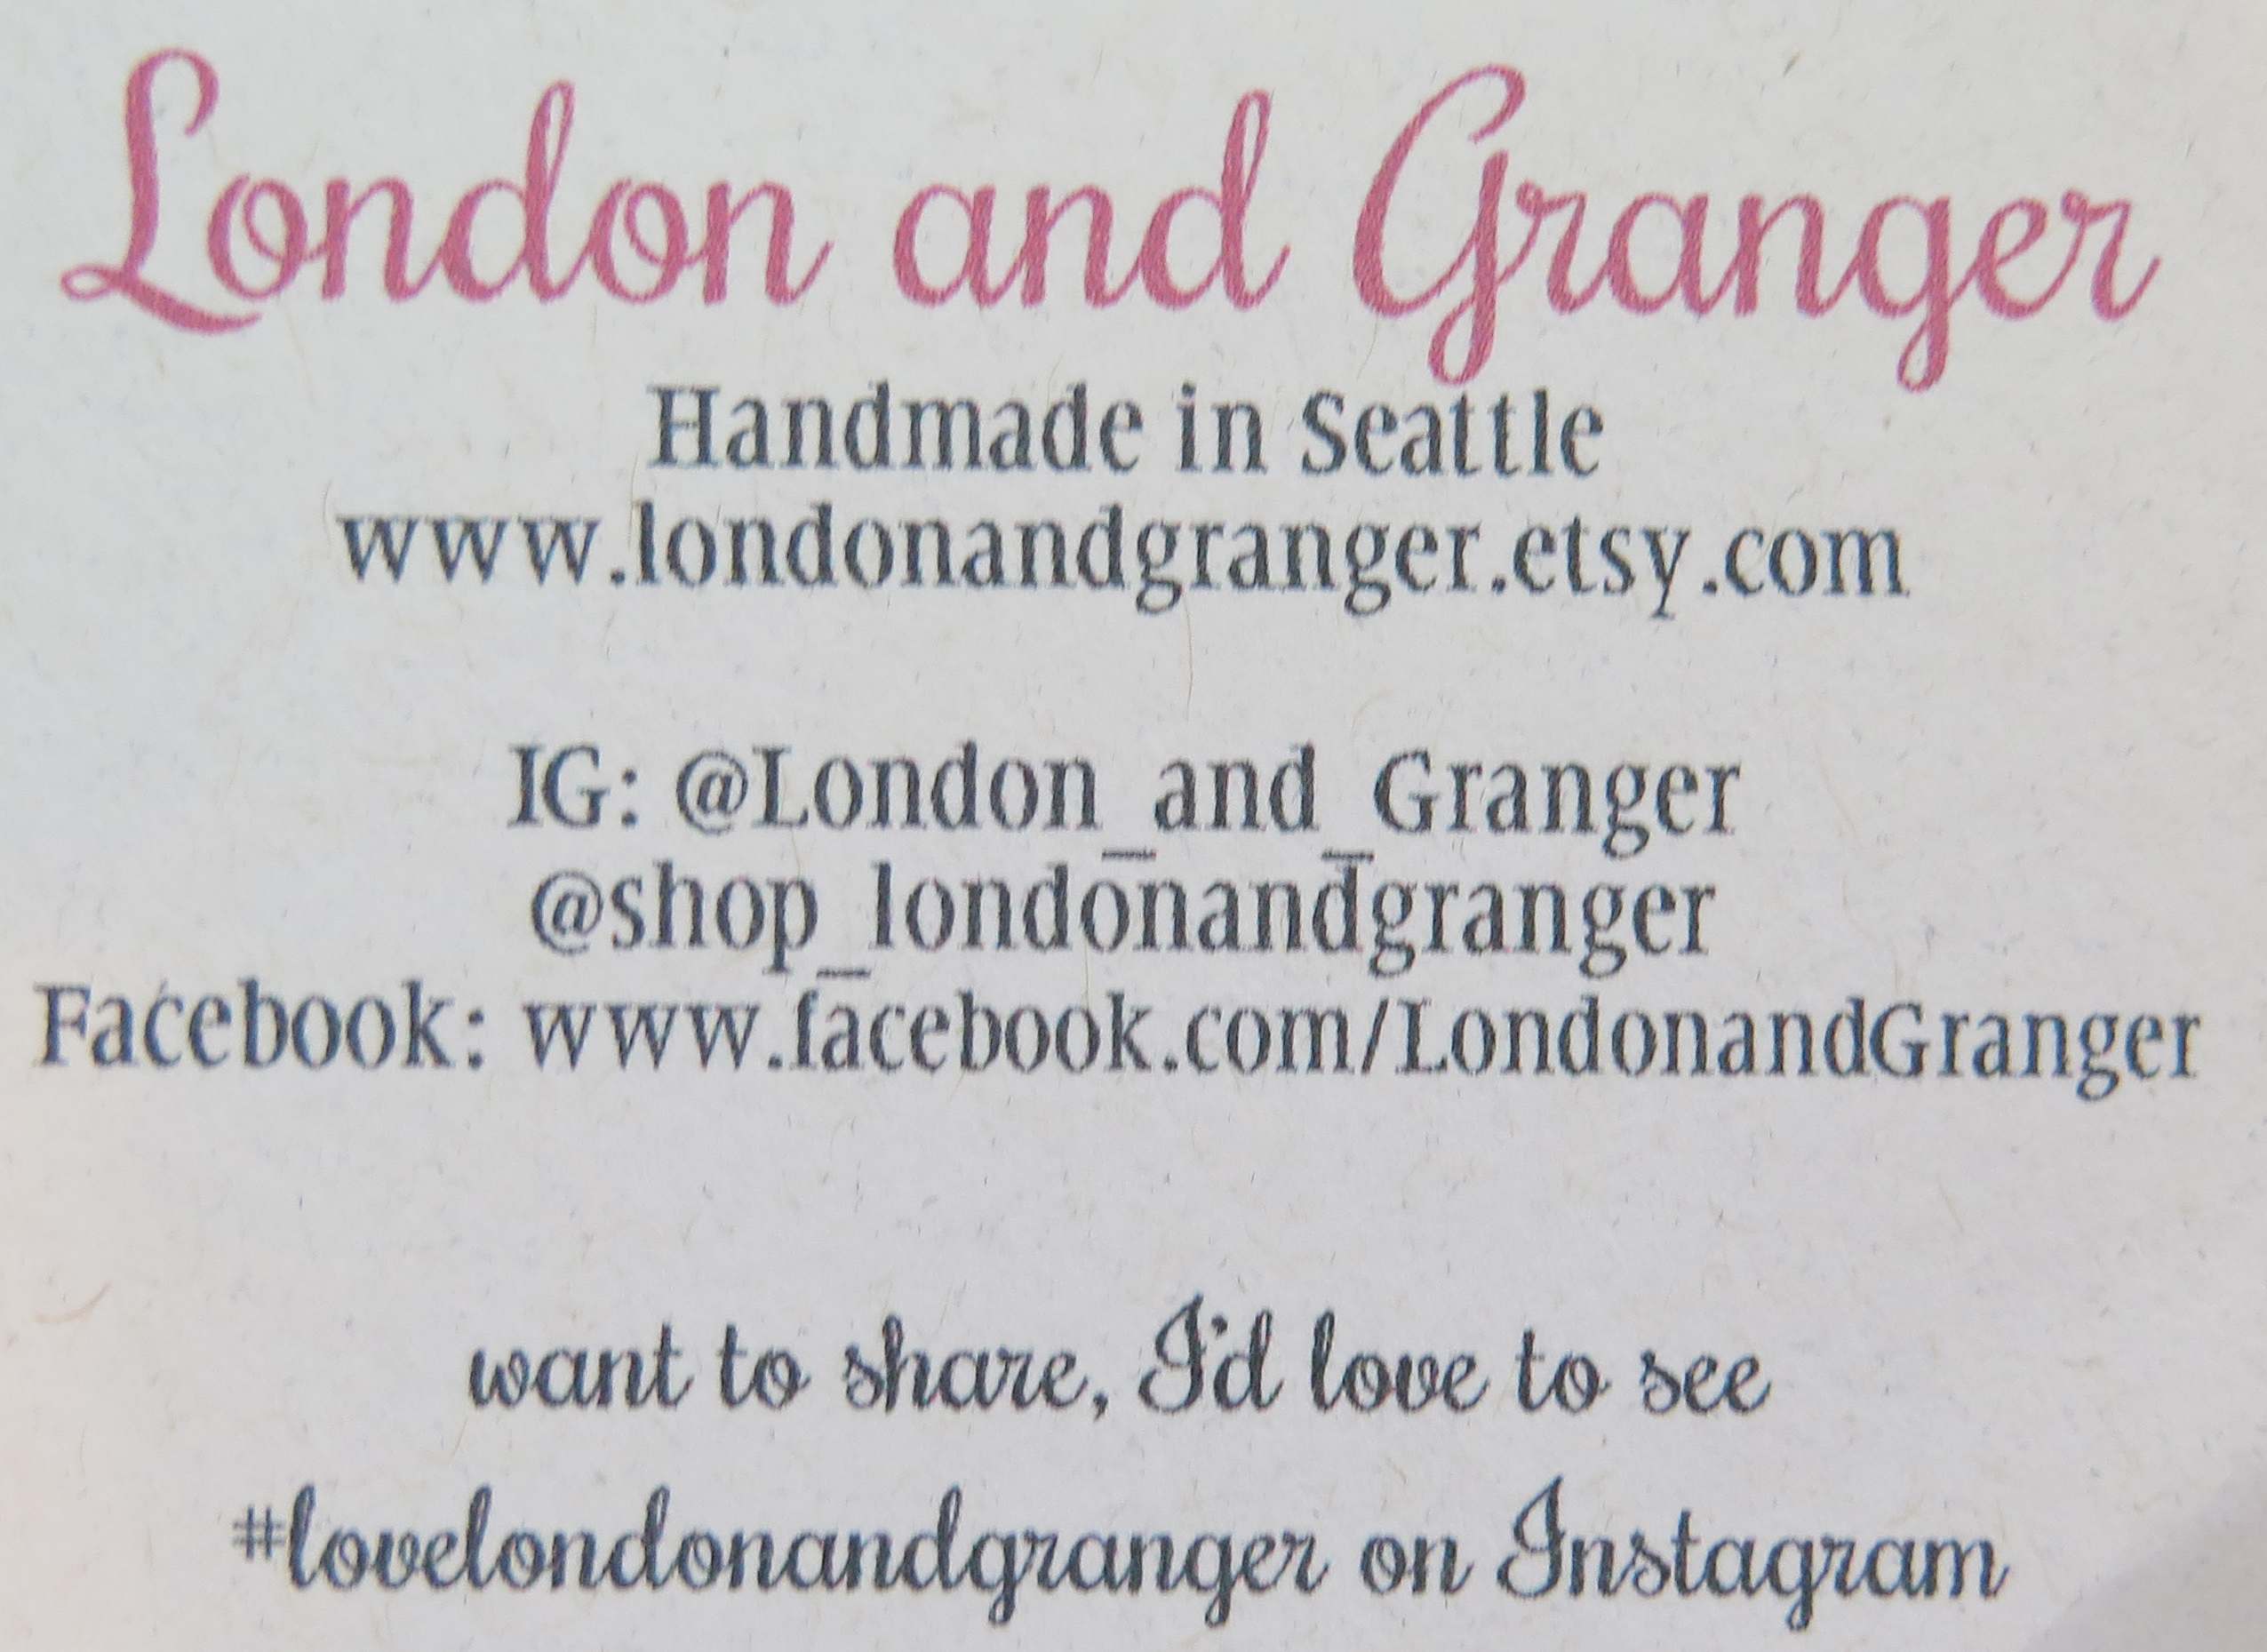 London and Granger